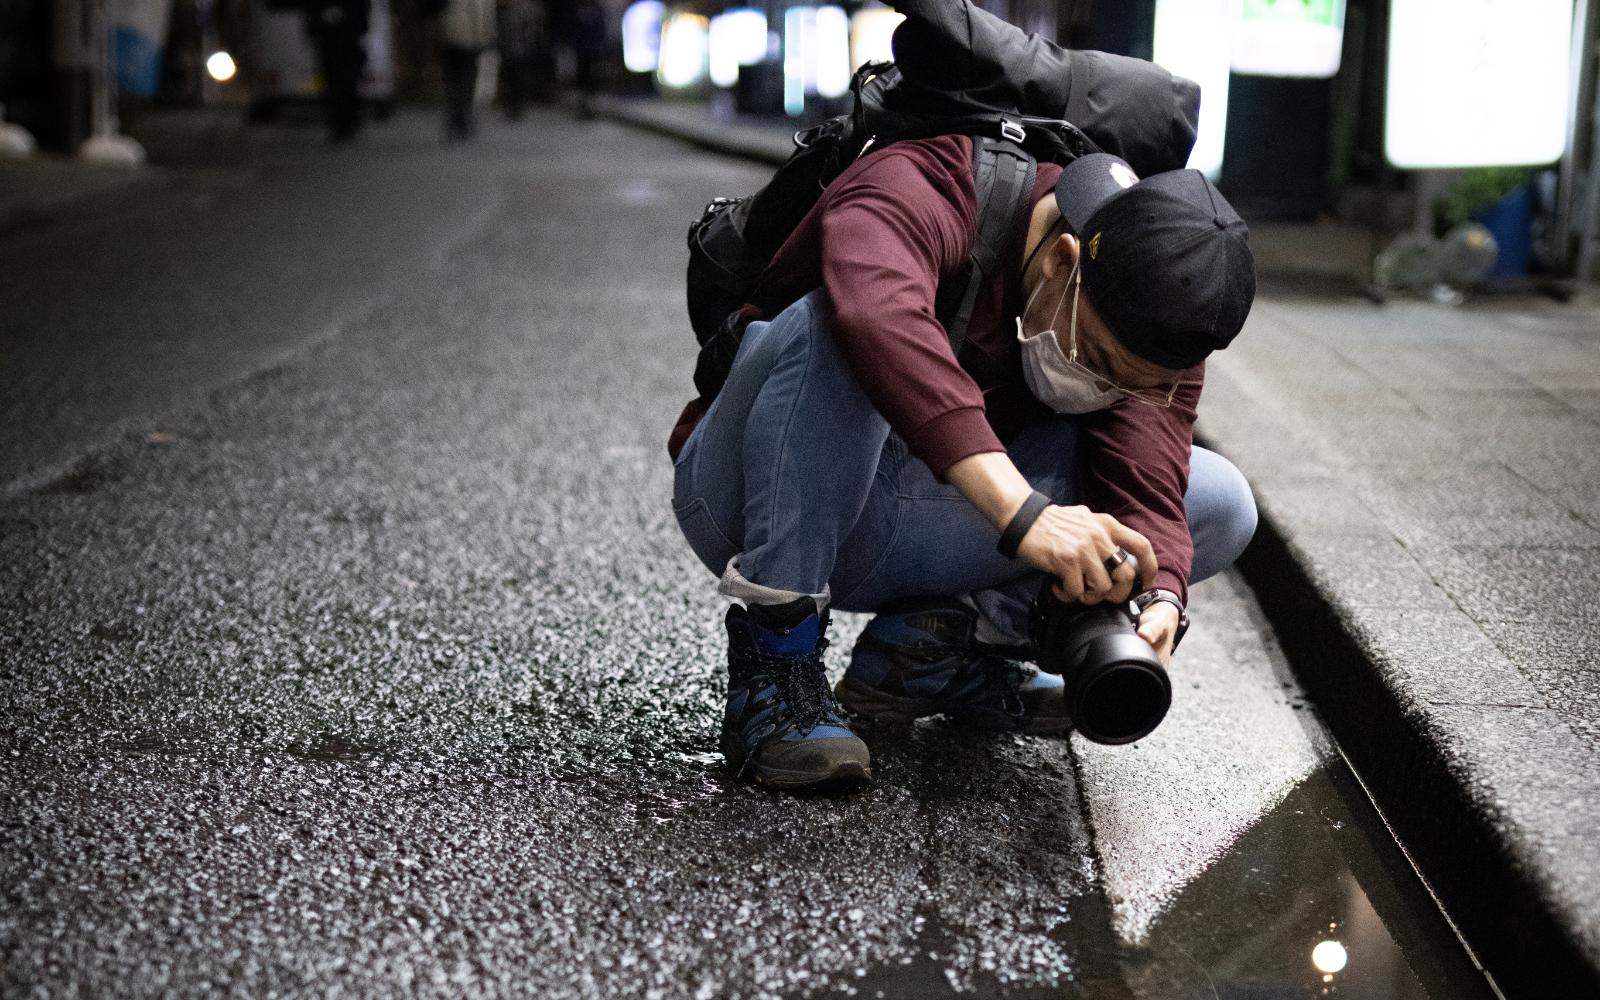 Photo snapping at Yokohama